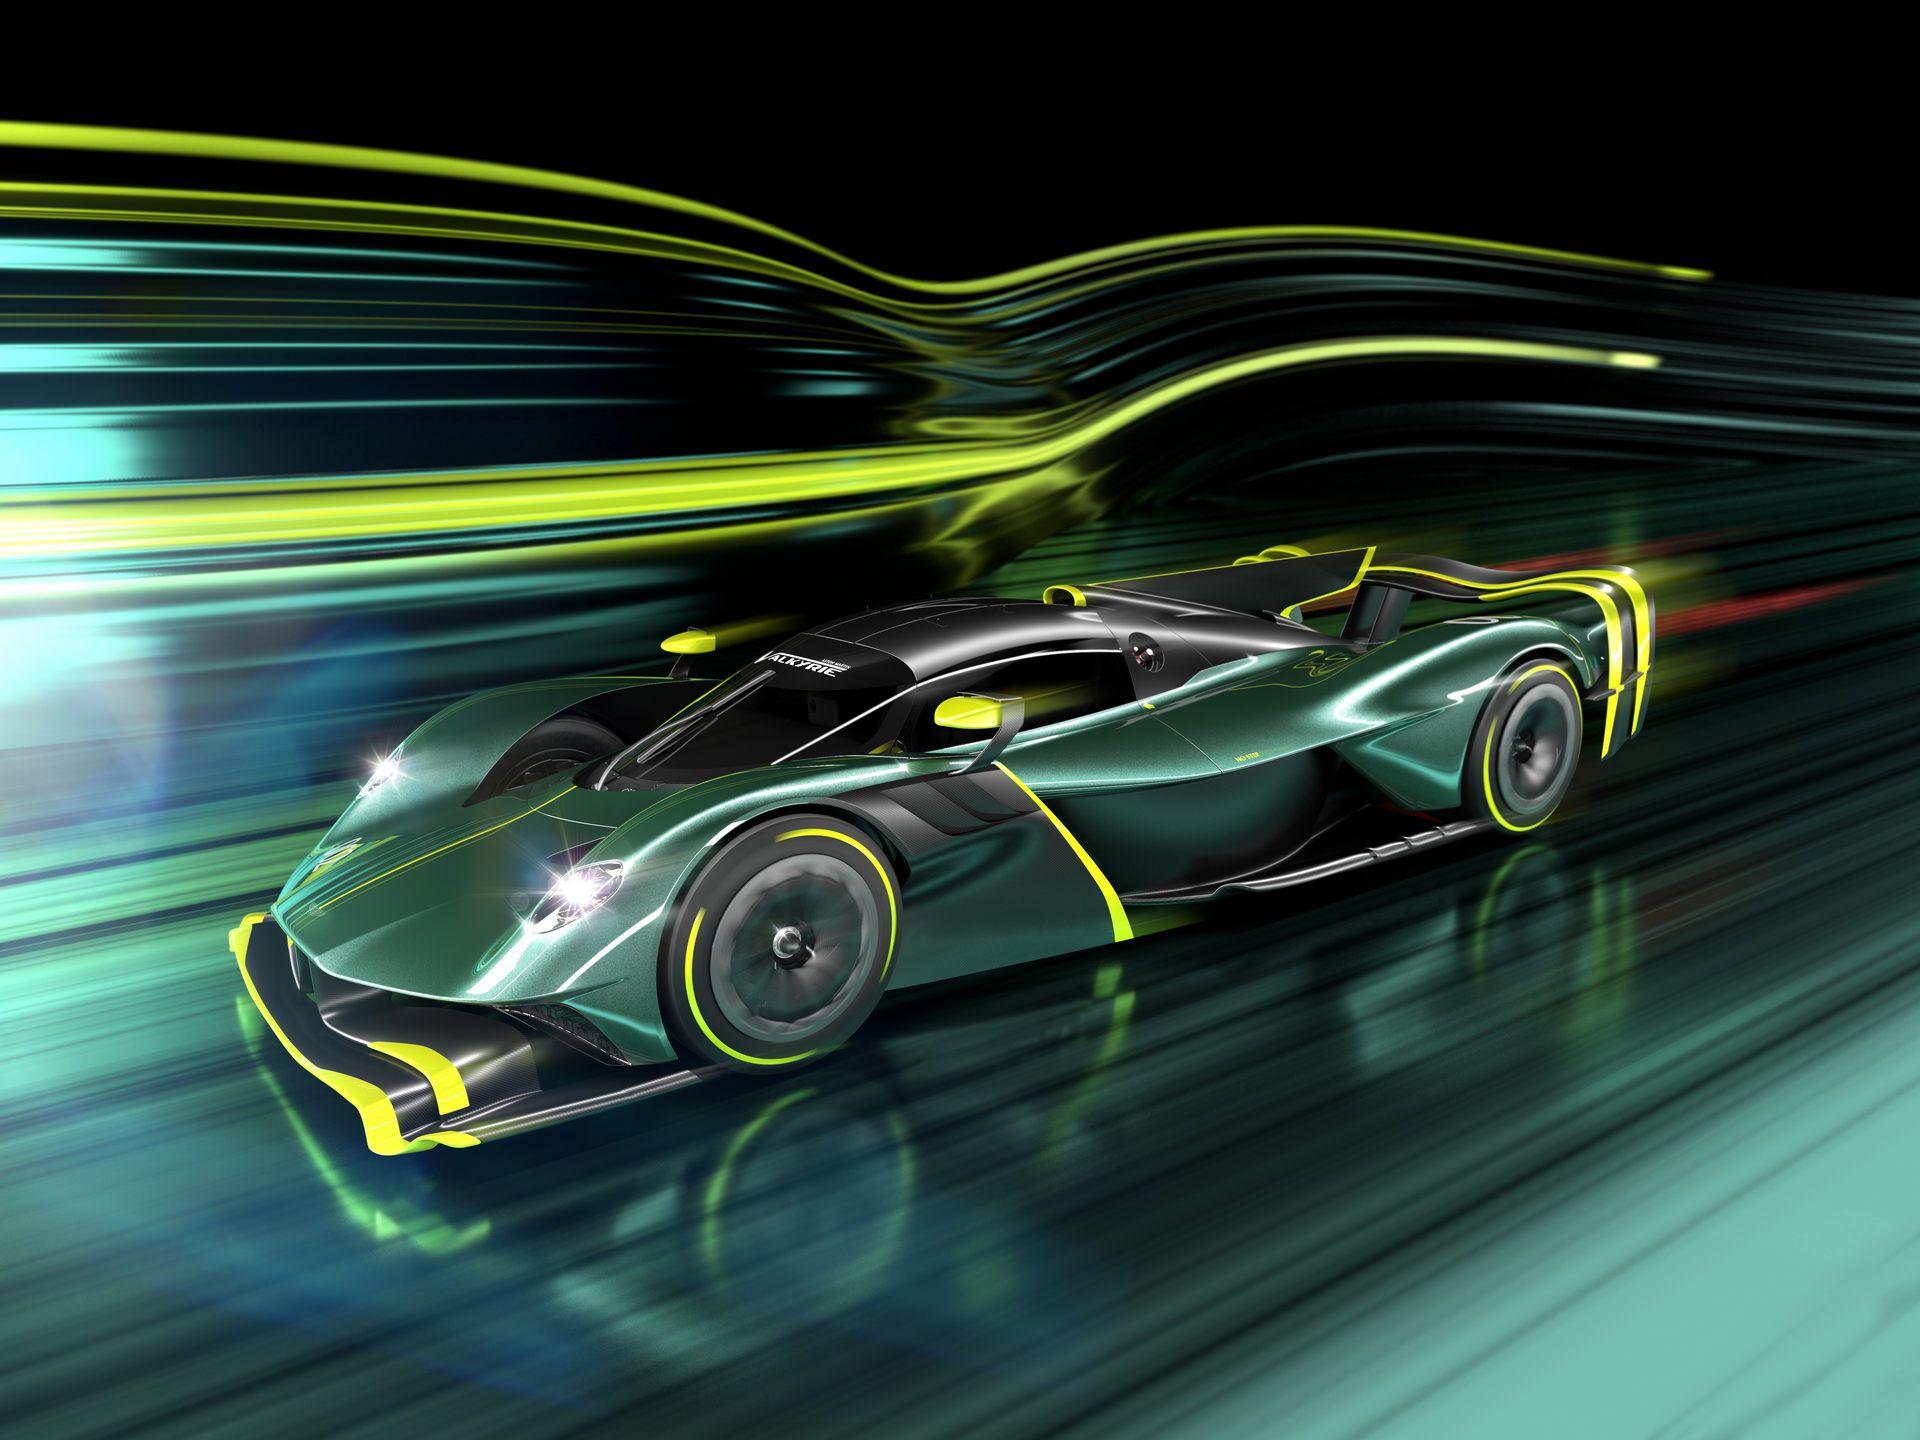 Aston-Martin-Valkyrie-AMR-Pro-production-version-1